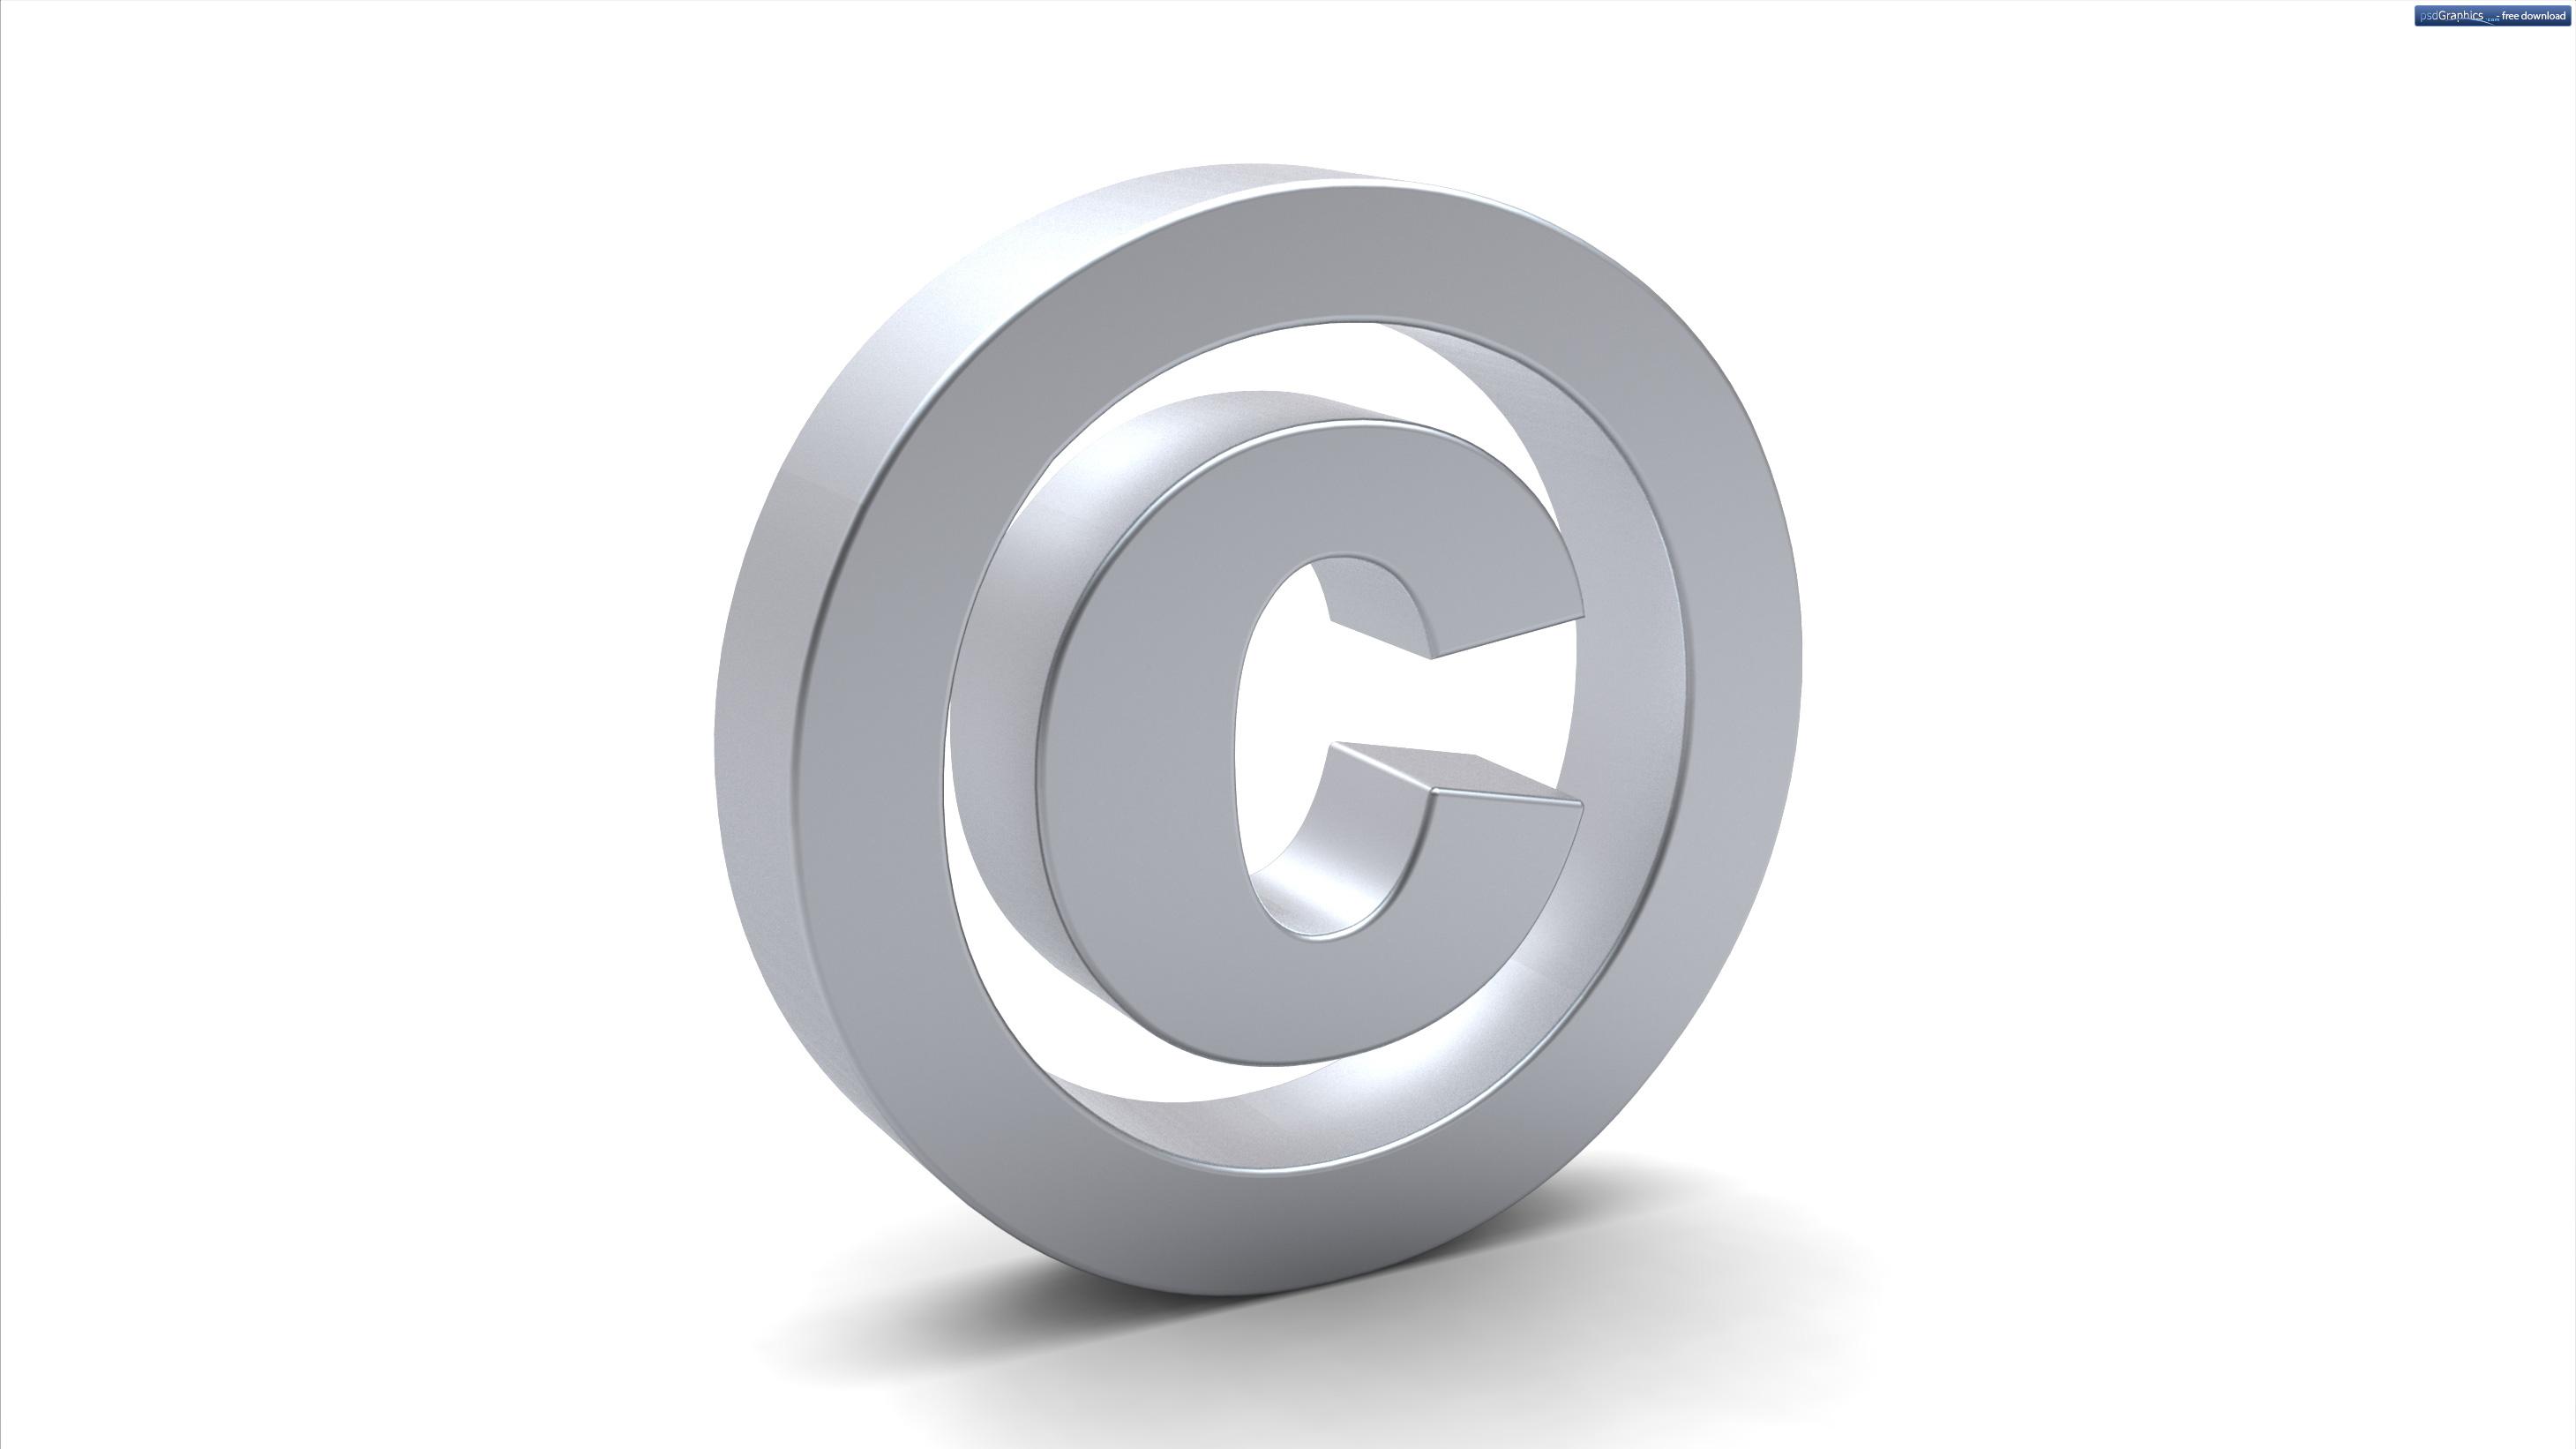 3d Copyright Symbol Psdgraphics